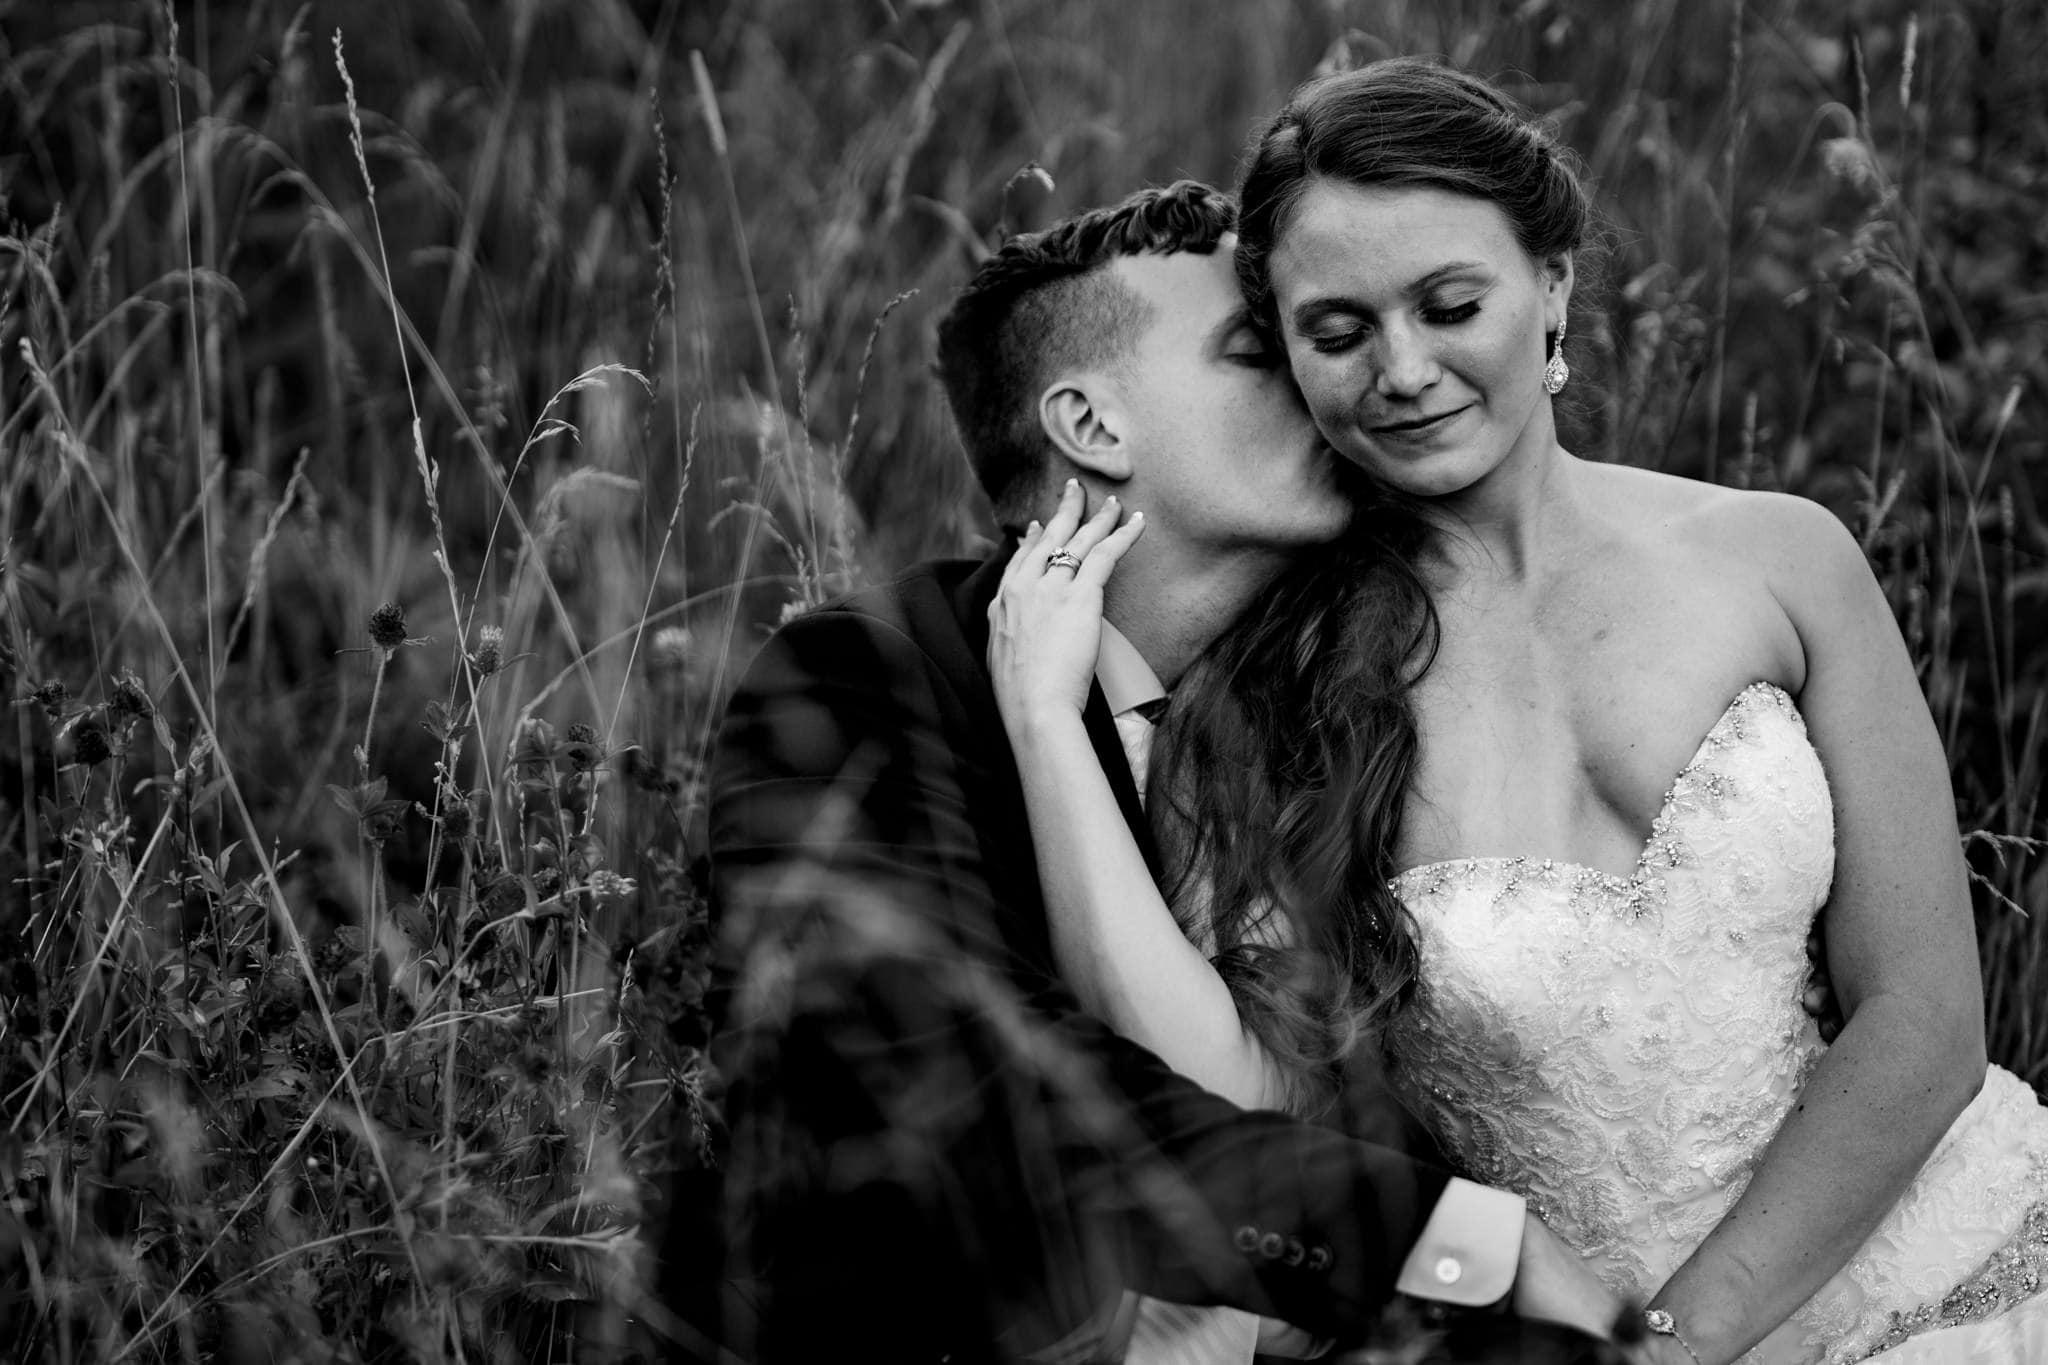 Studio 22 Photography - Intimate Wedding Photos